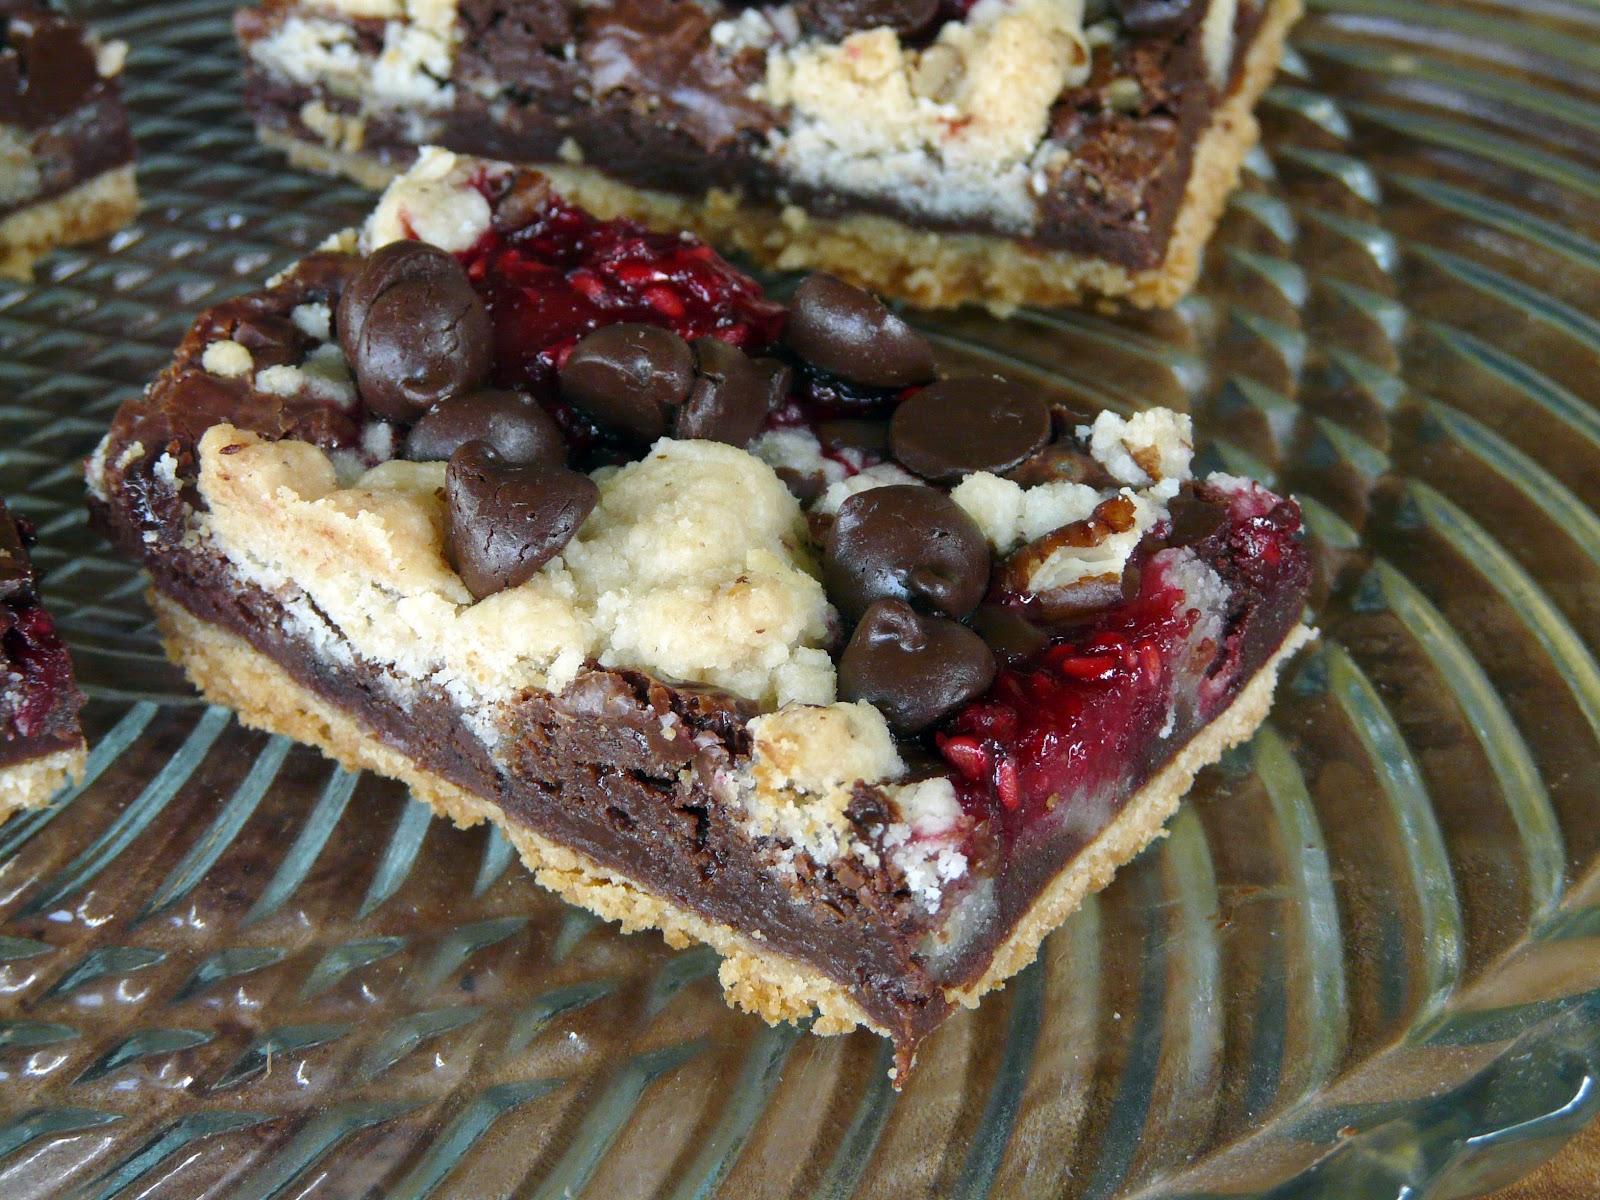 Thibeault S Table Chocolate Raspberry Crumb Bars